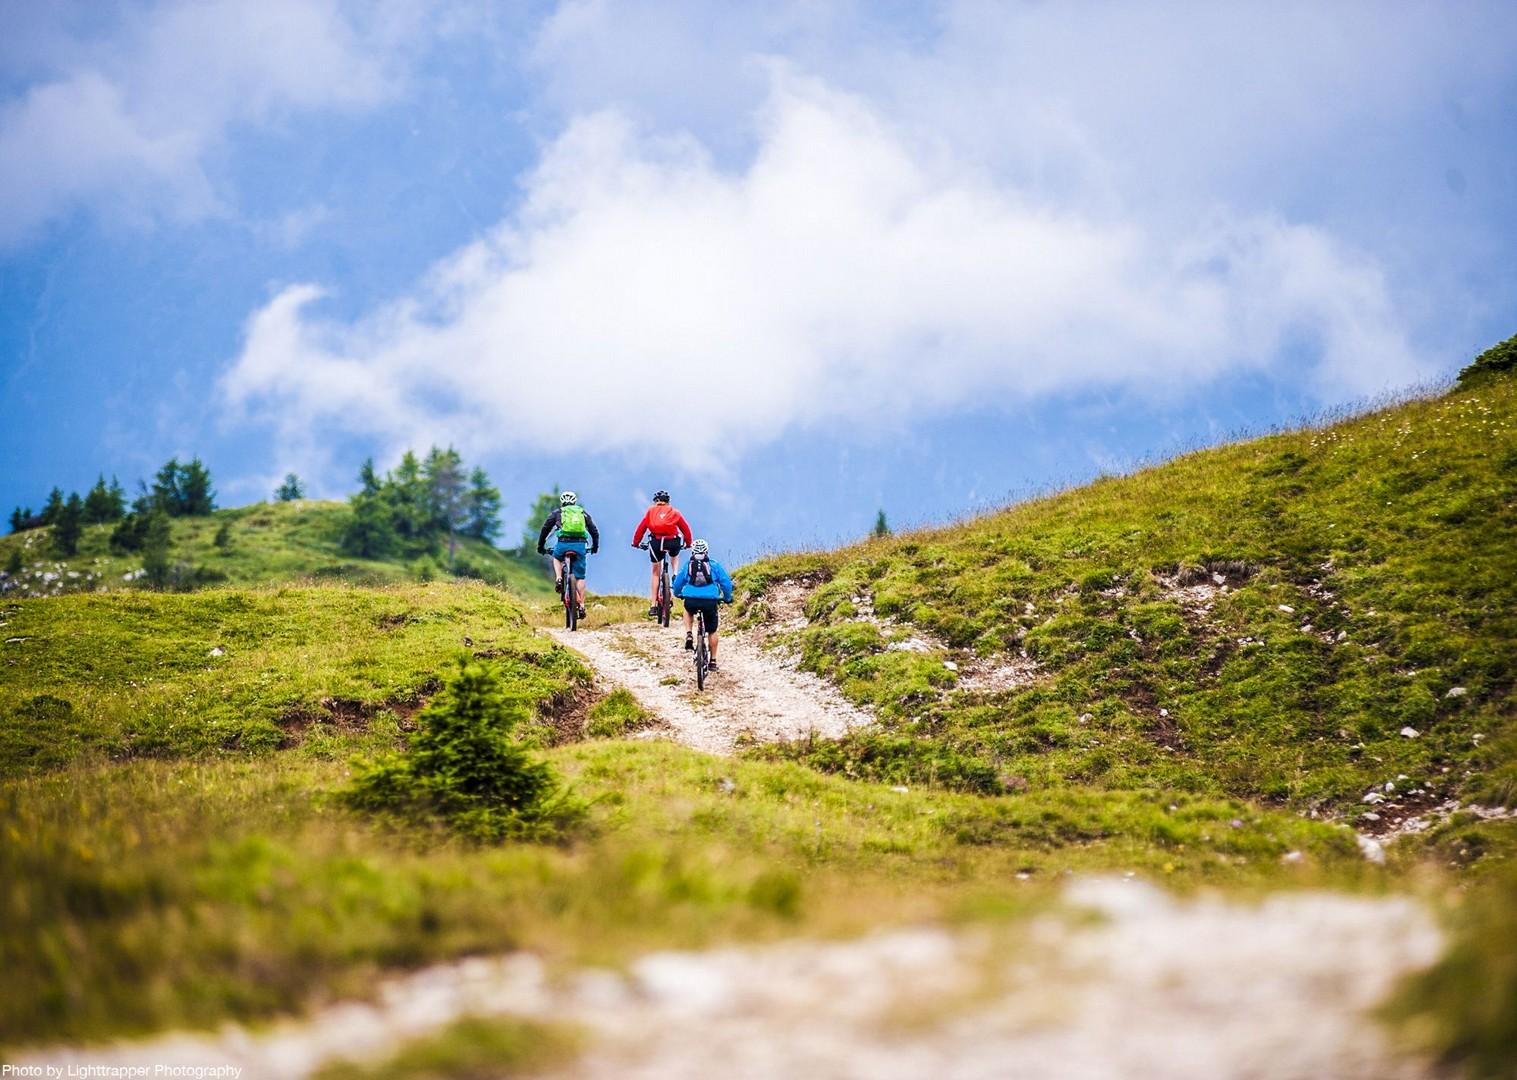 saddle_skedaddle_italy_2017_day6_brenta_dolomites_200-2.jpg - Italy - Dolomites of Brenta - Guided Mountain Bike Holiday - Mountain Biking